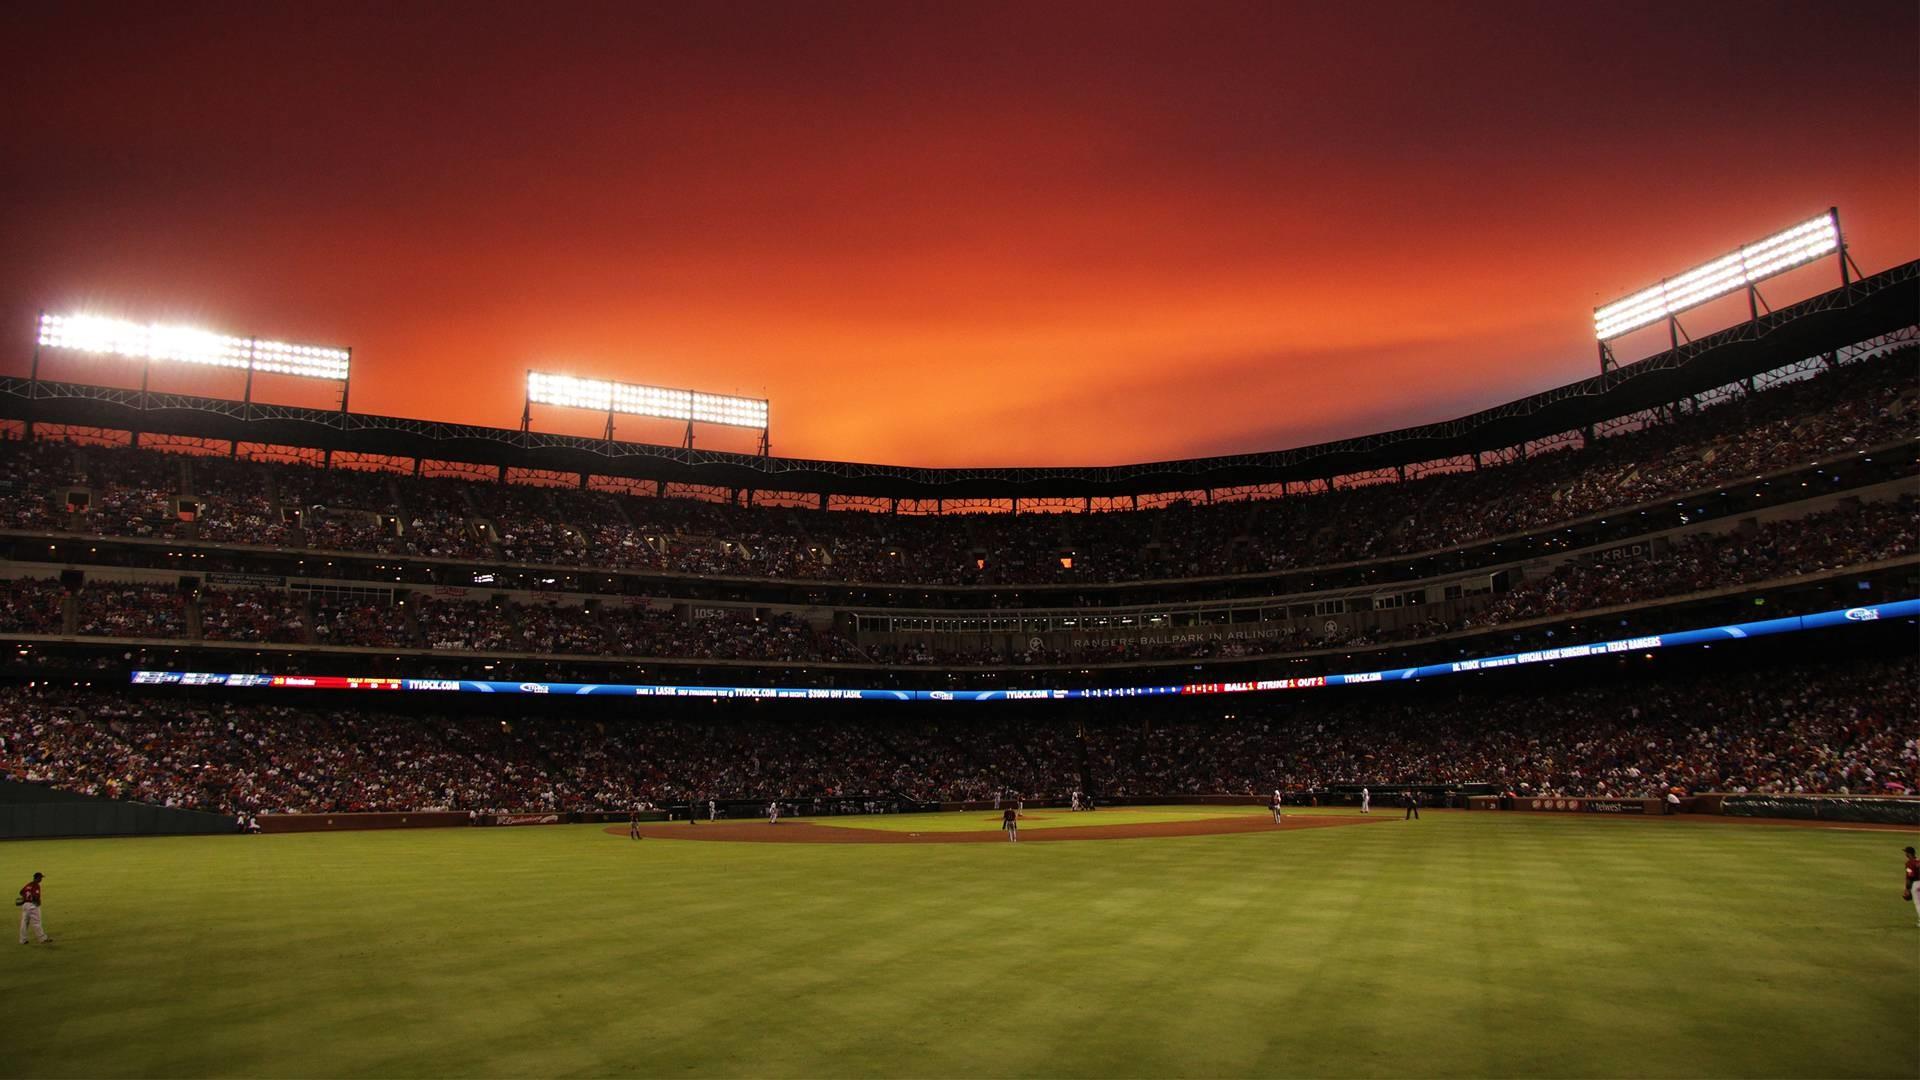 Download Baseball Stadium Hd Wallpaper Picture 47520 Label .